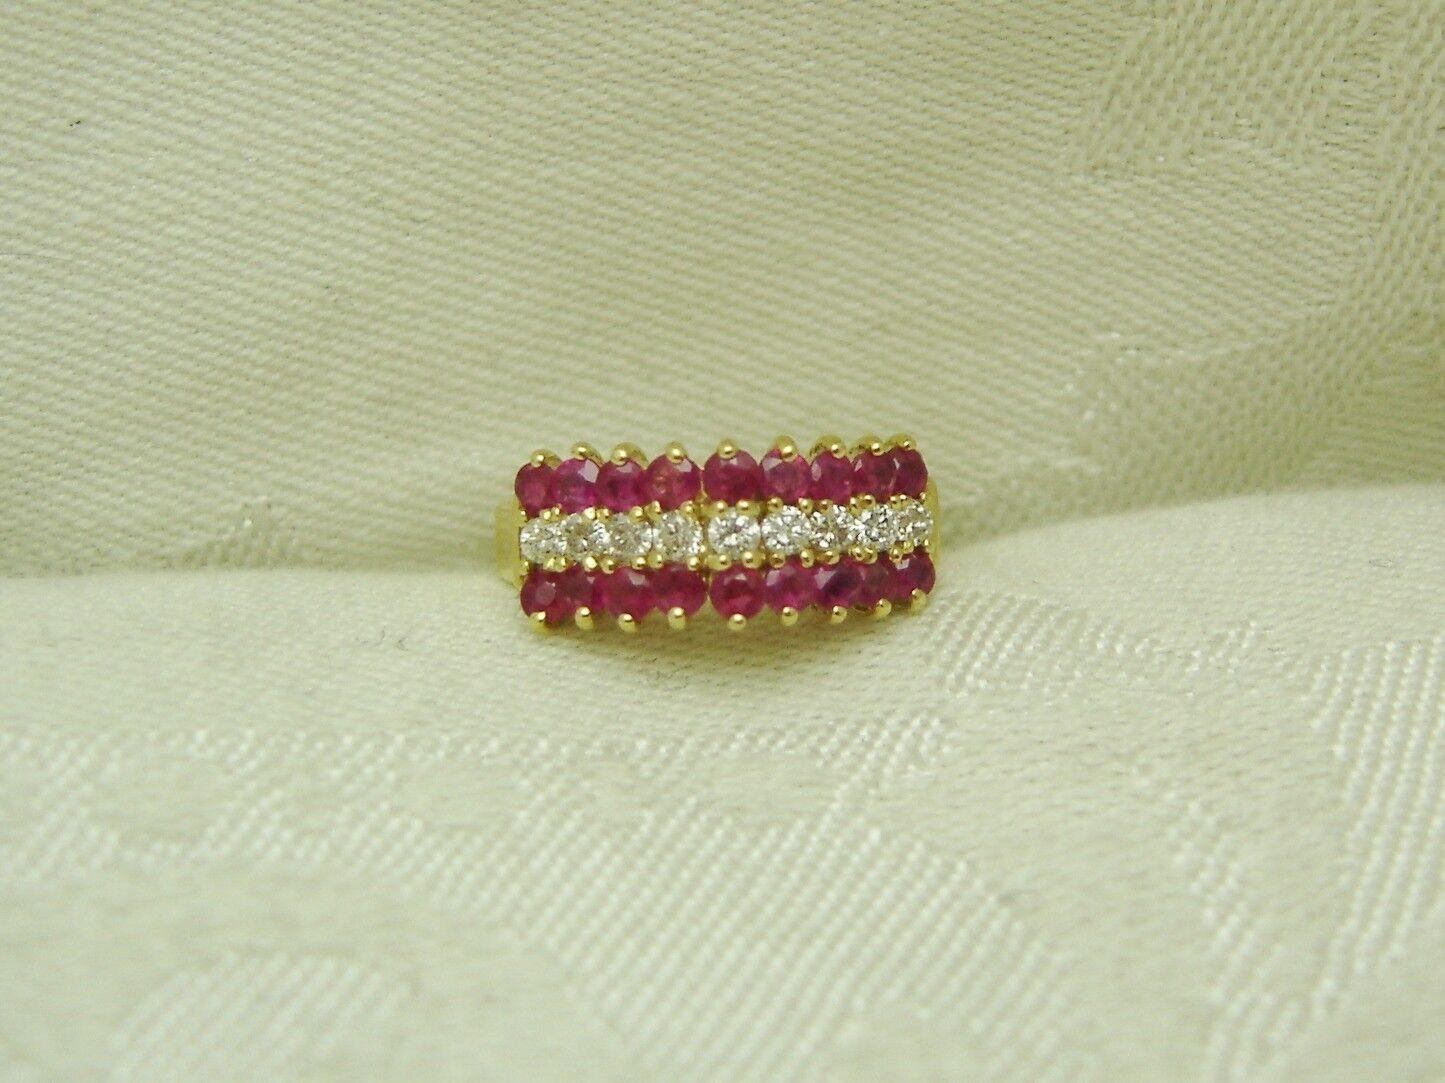 14K Solid Yellow gold RUBY & DIAMOND RING SIZE 5 3 4 JULY BIRTHSTONE N10-K